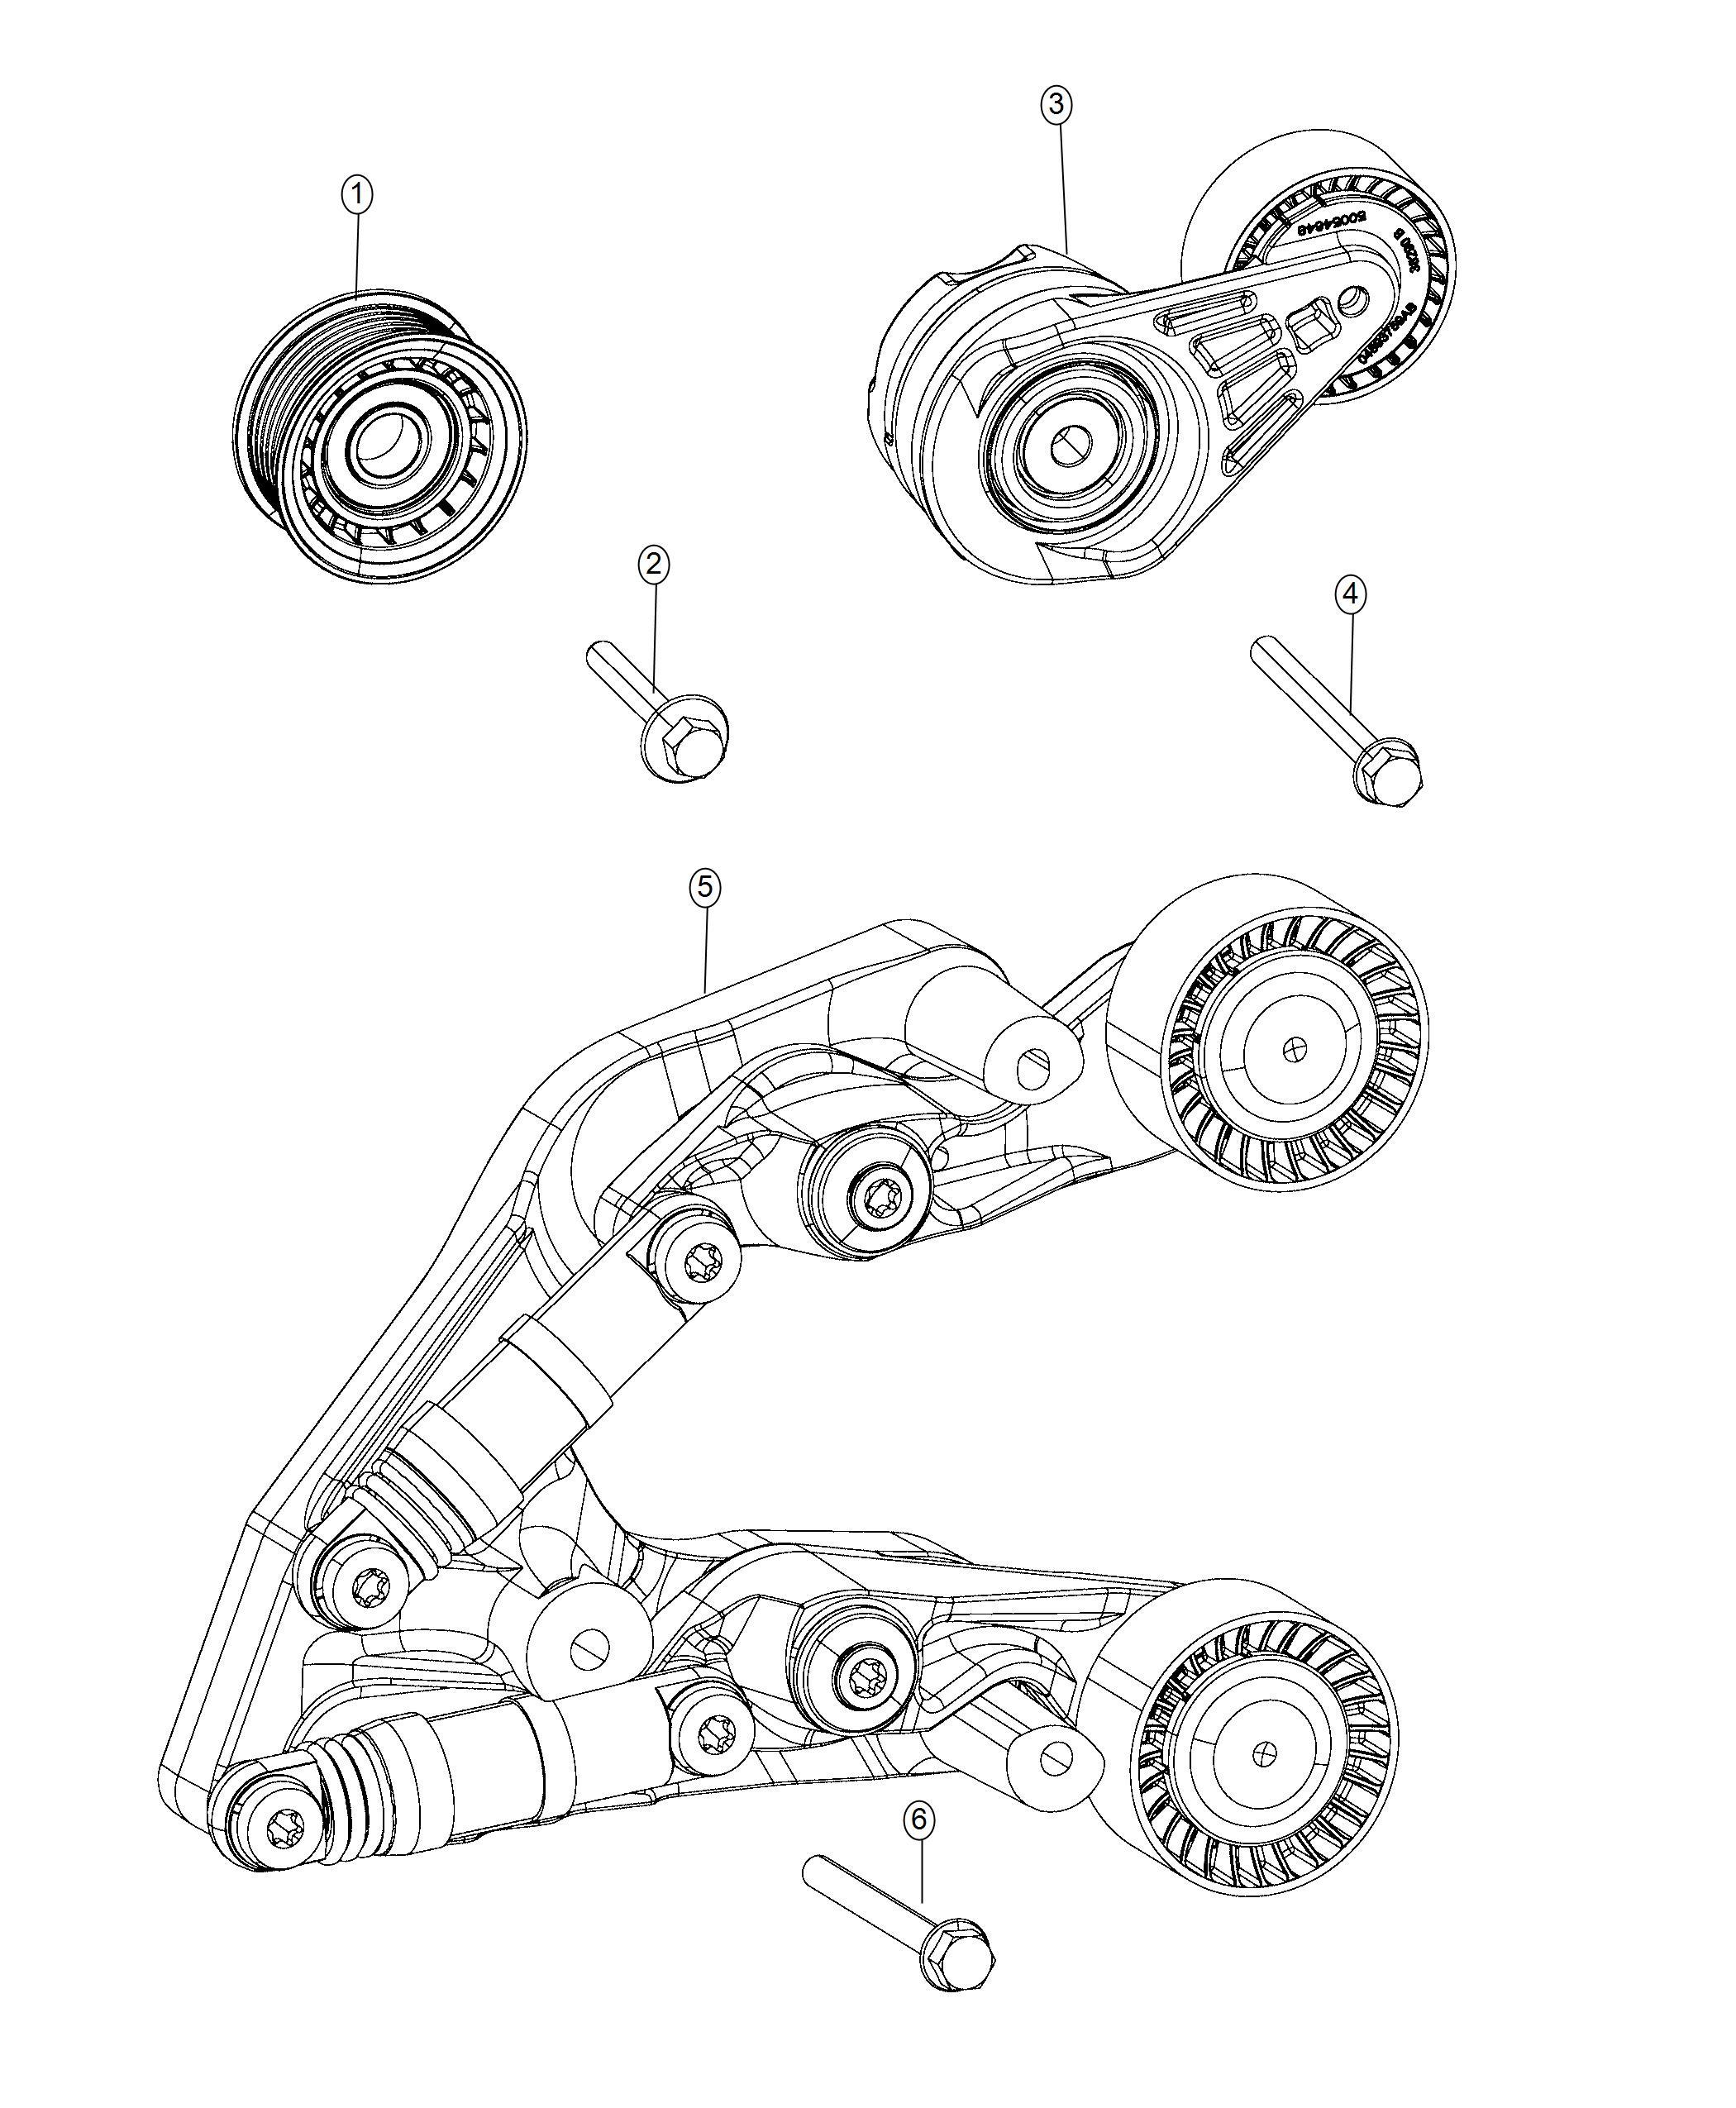 Jeep Wrangler Tensioner Belt Related Pulleys Fca